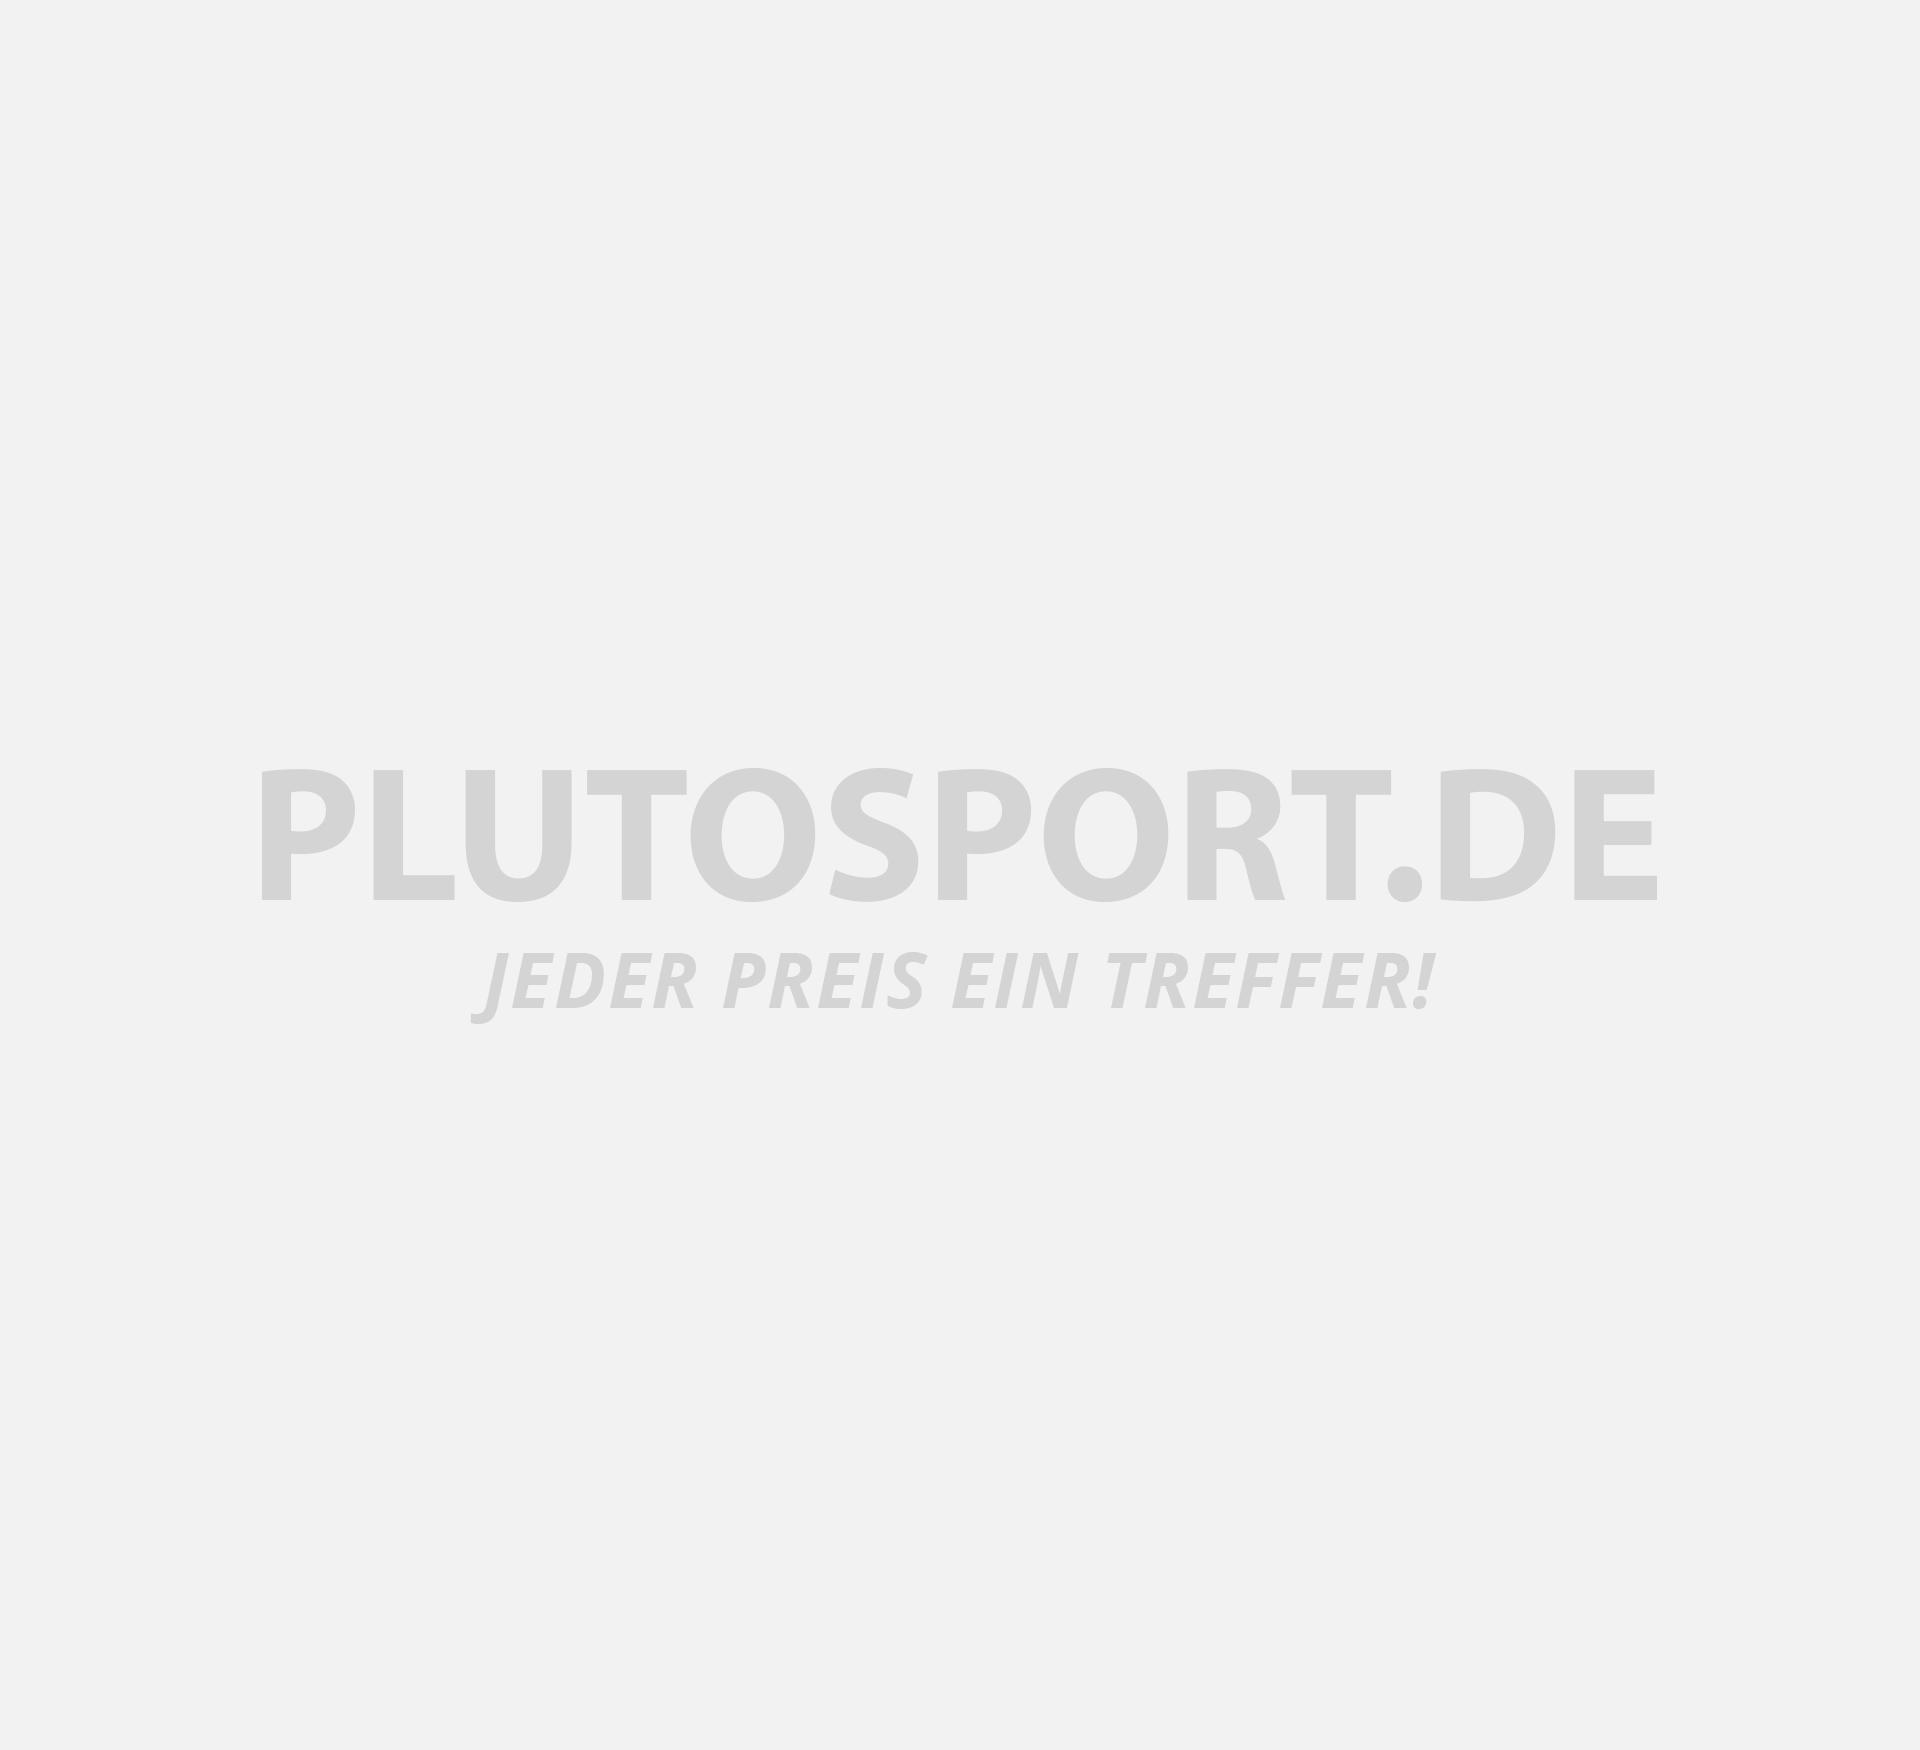 Adidas Adidas Kaiser Kaiser Liga 5 Liga 5 hQrxsBdCot